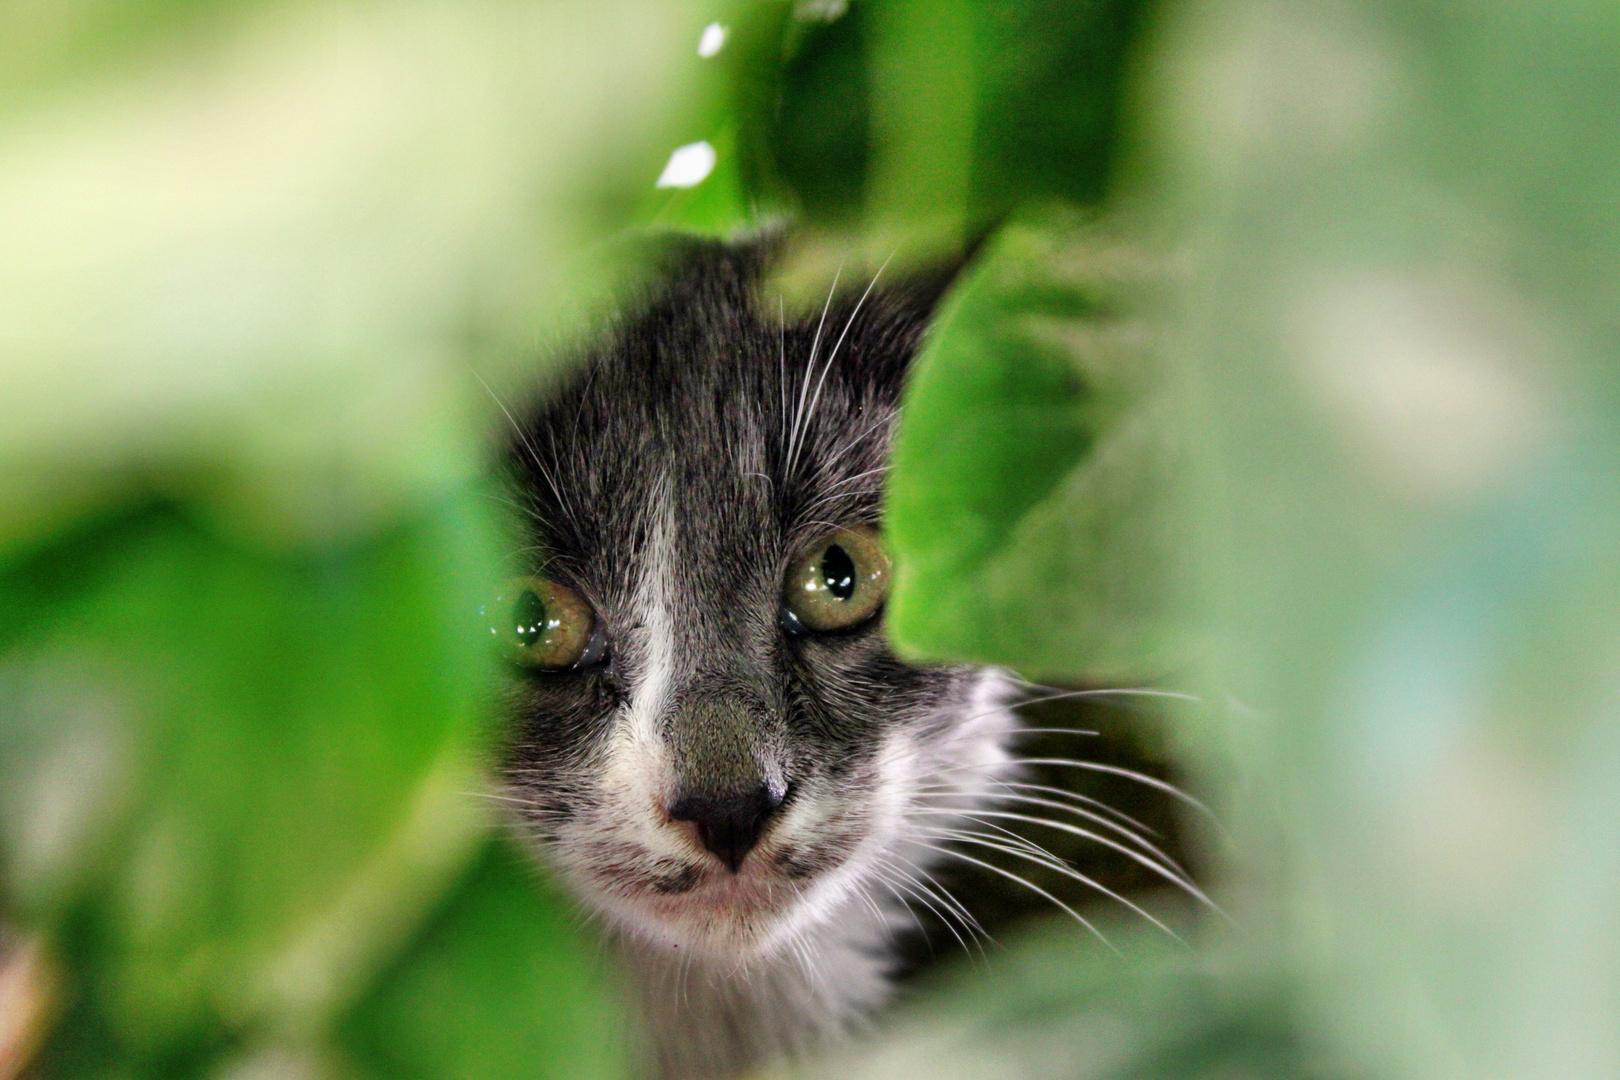 scheues Kätzchen